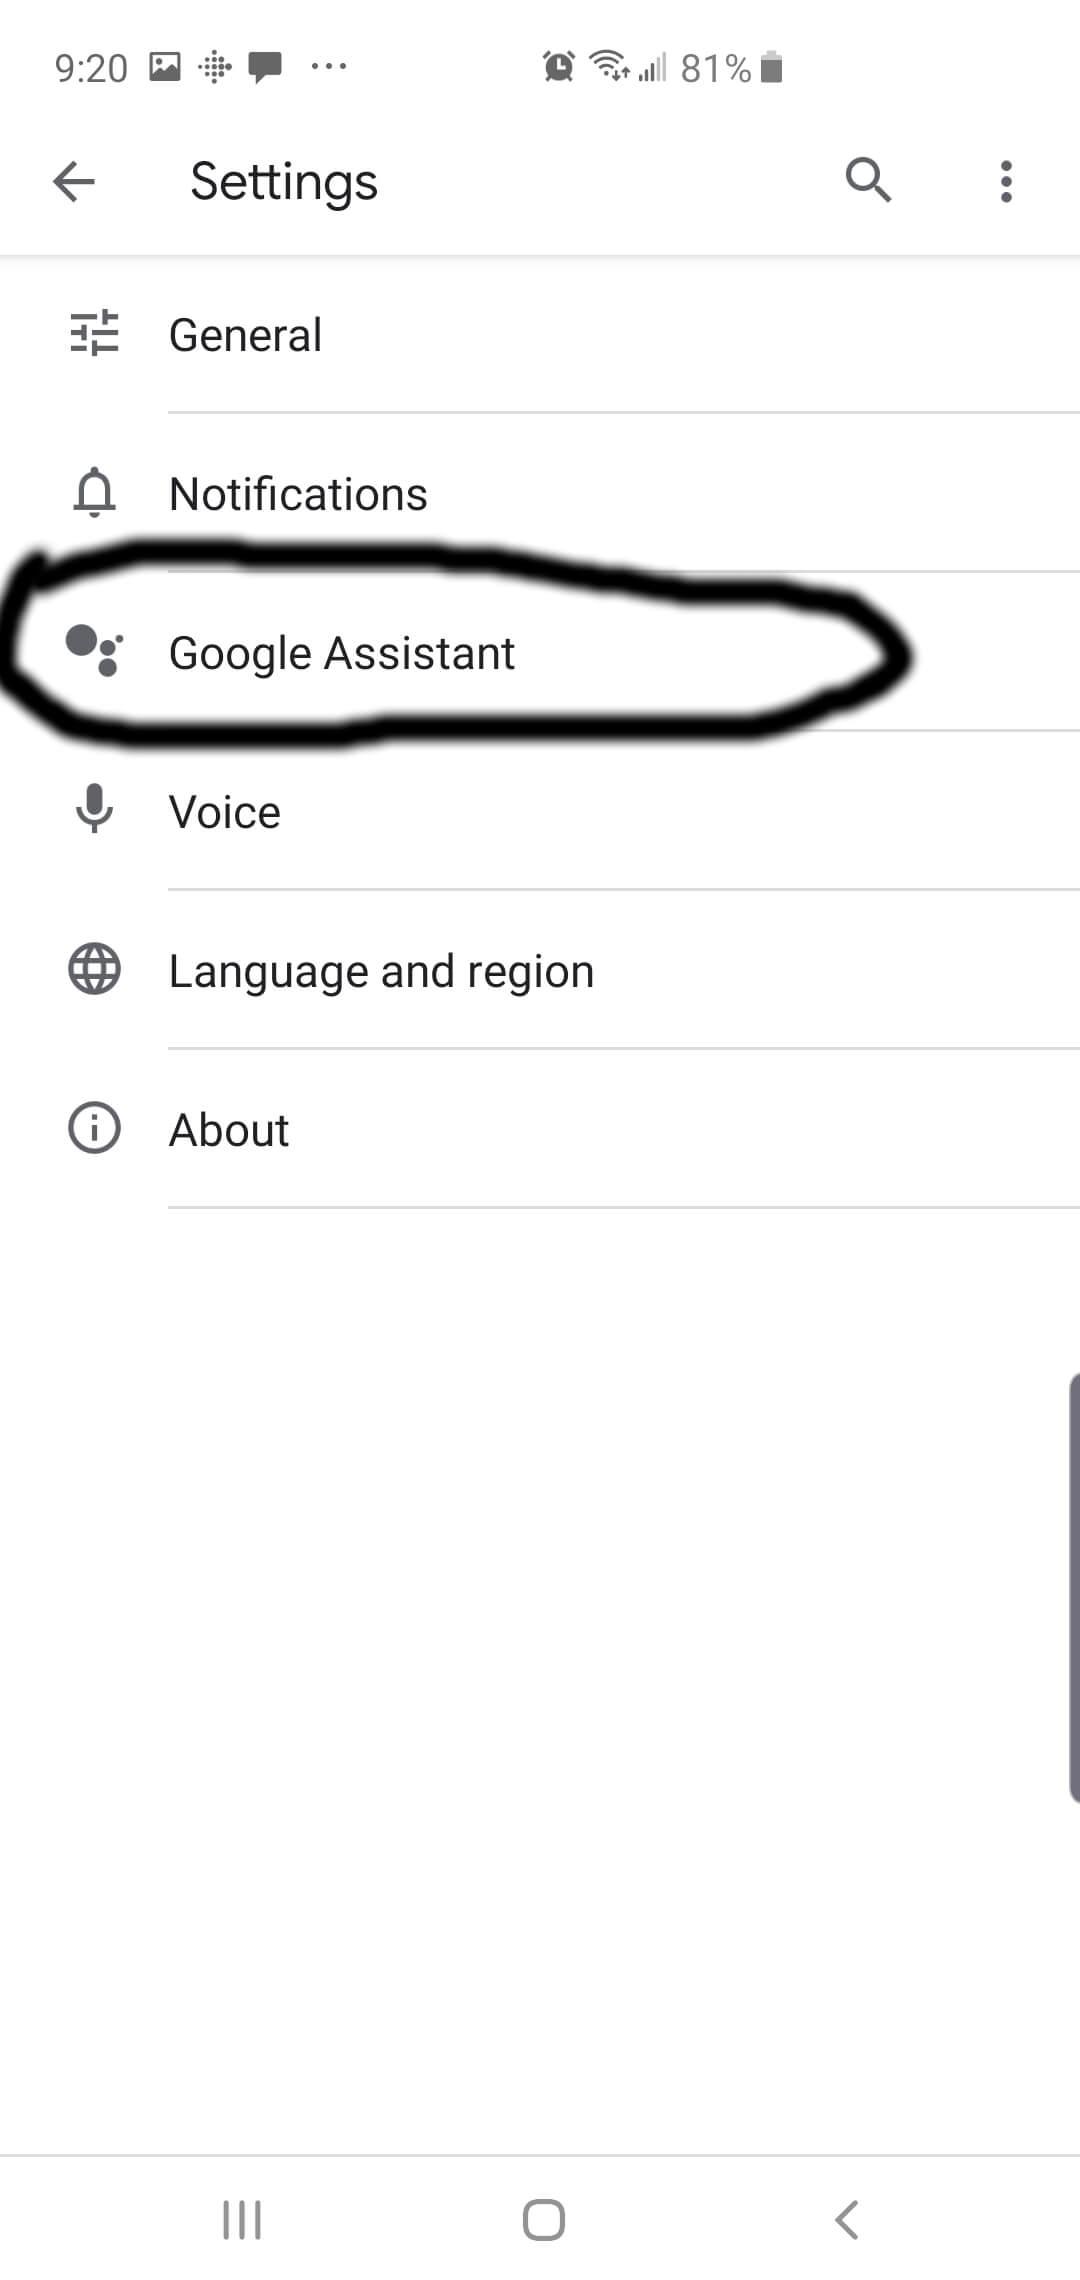 Tap Google Assistant